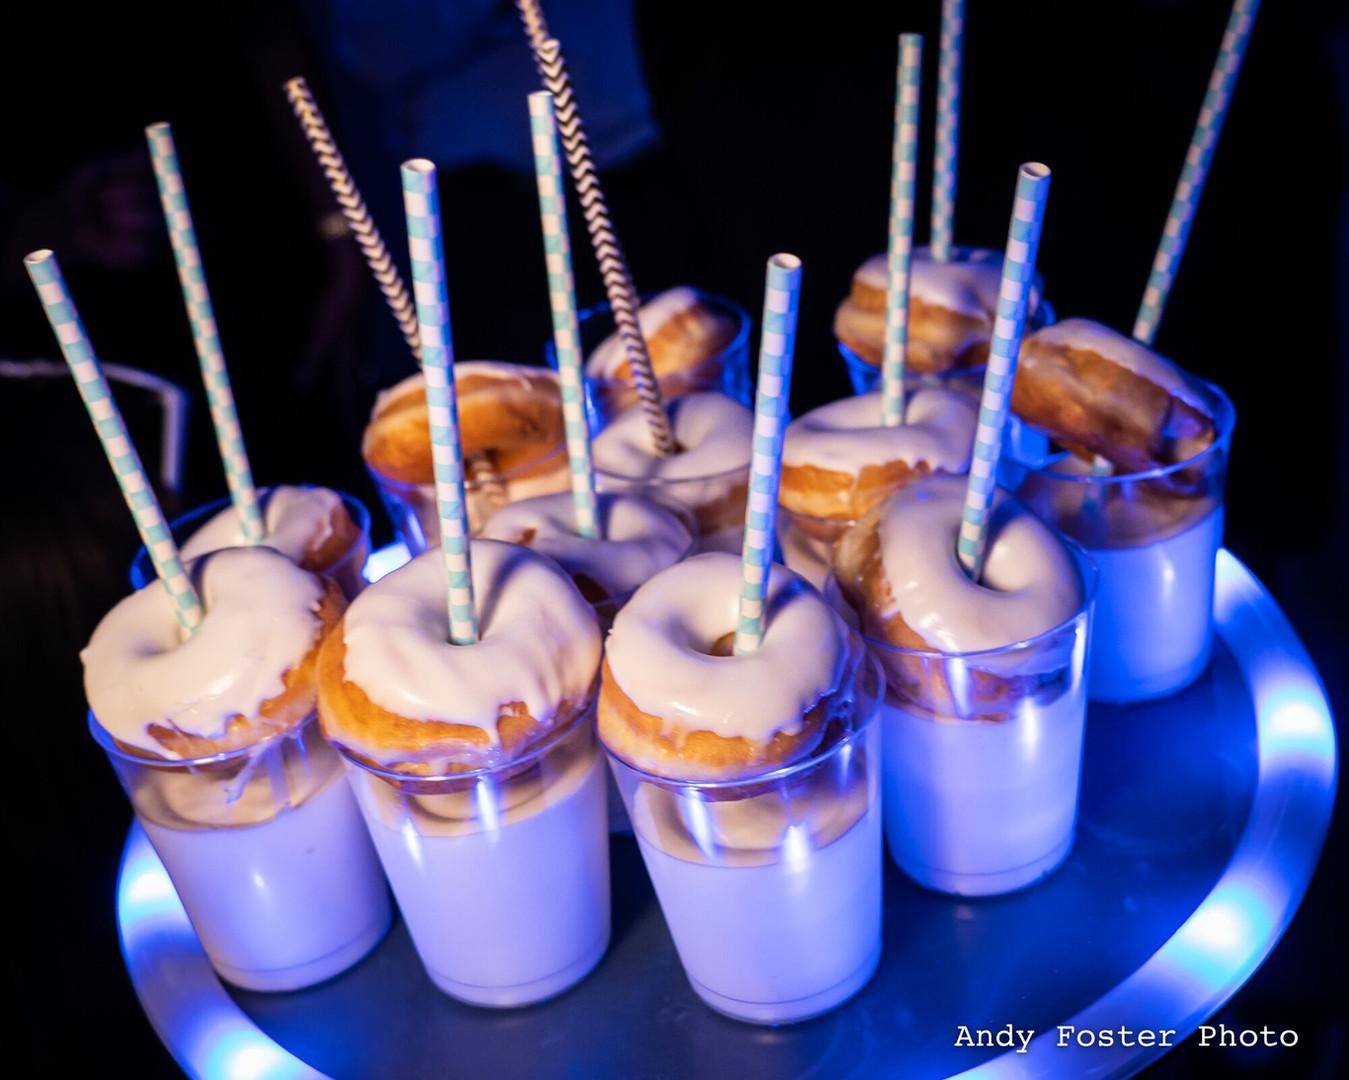 Milkshakes and Donuts